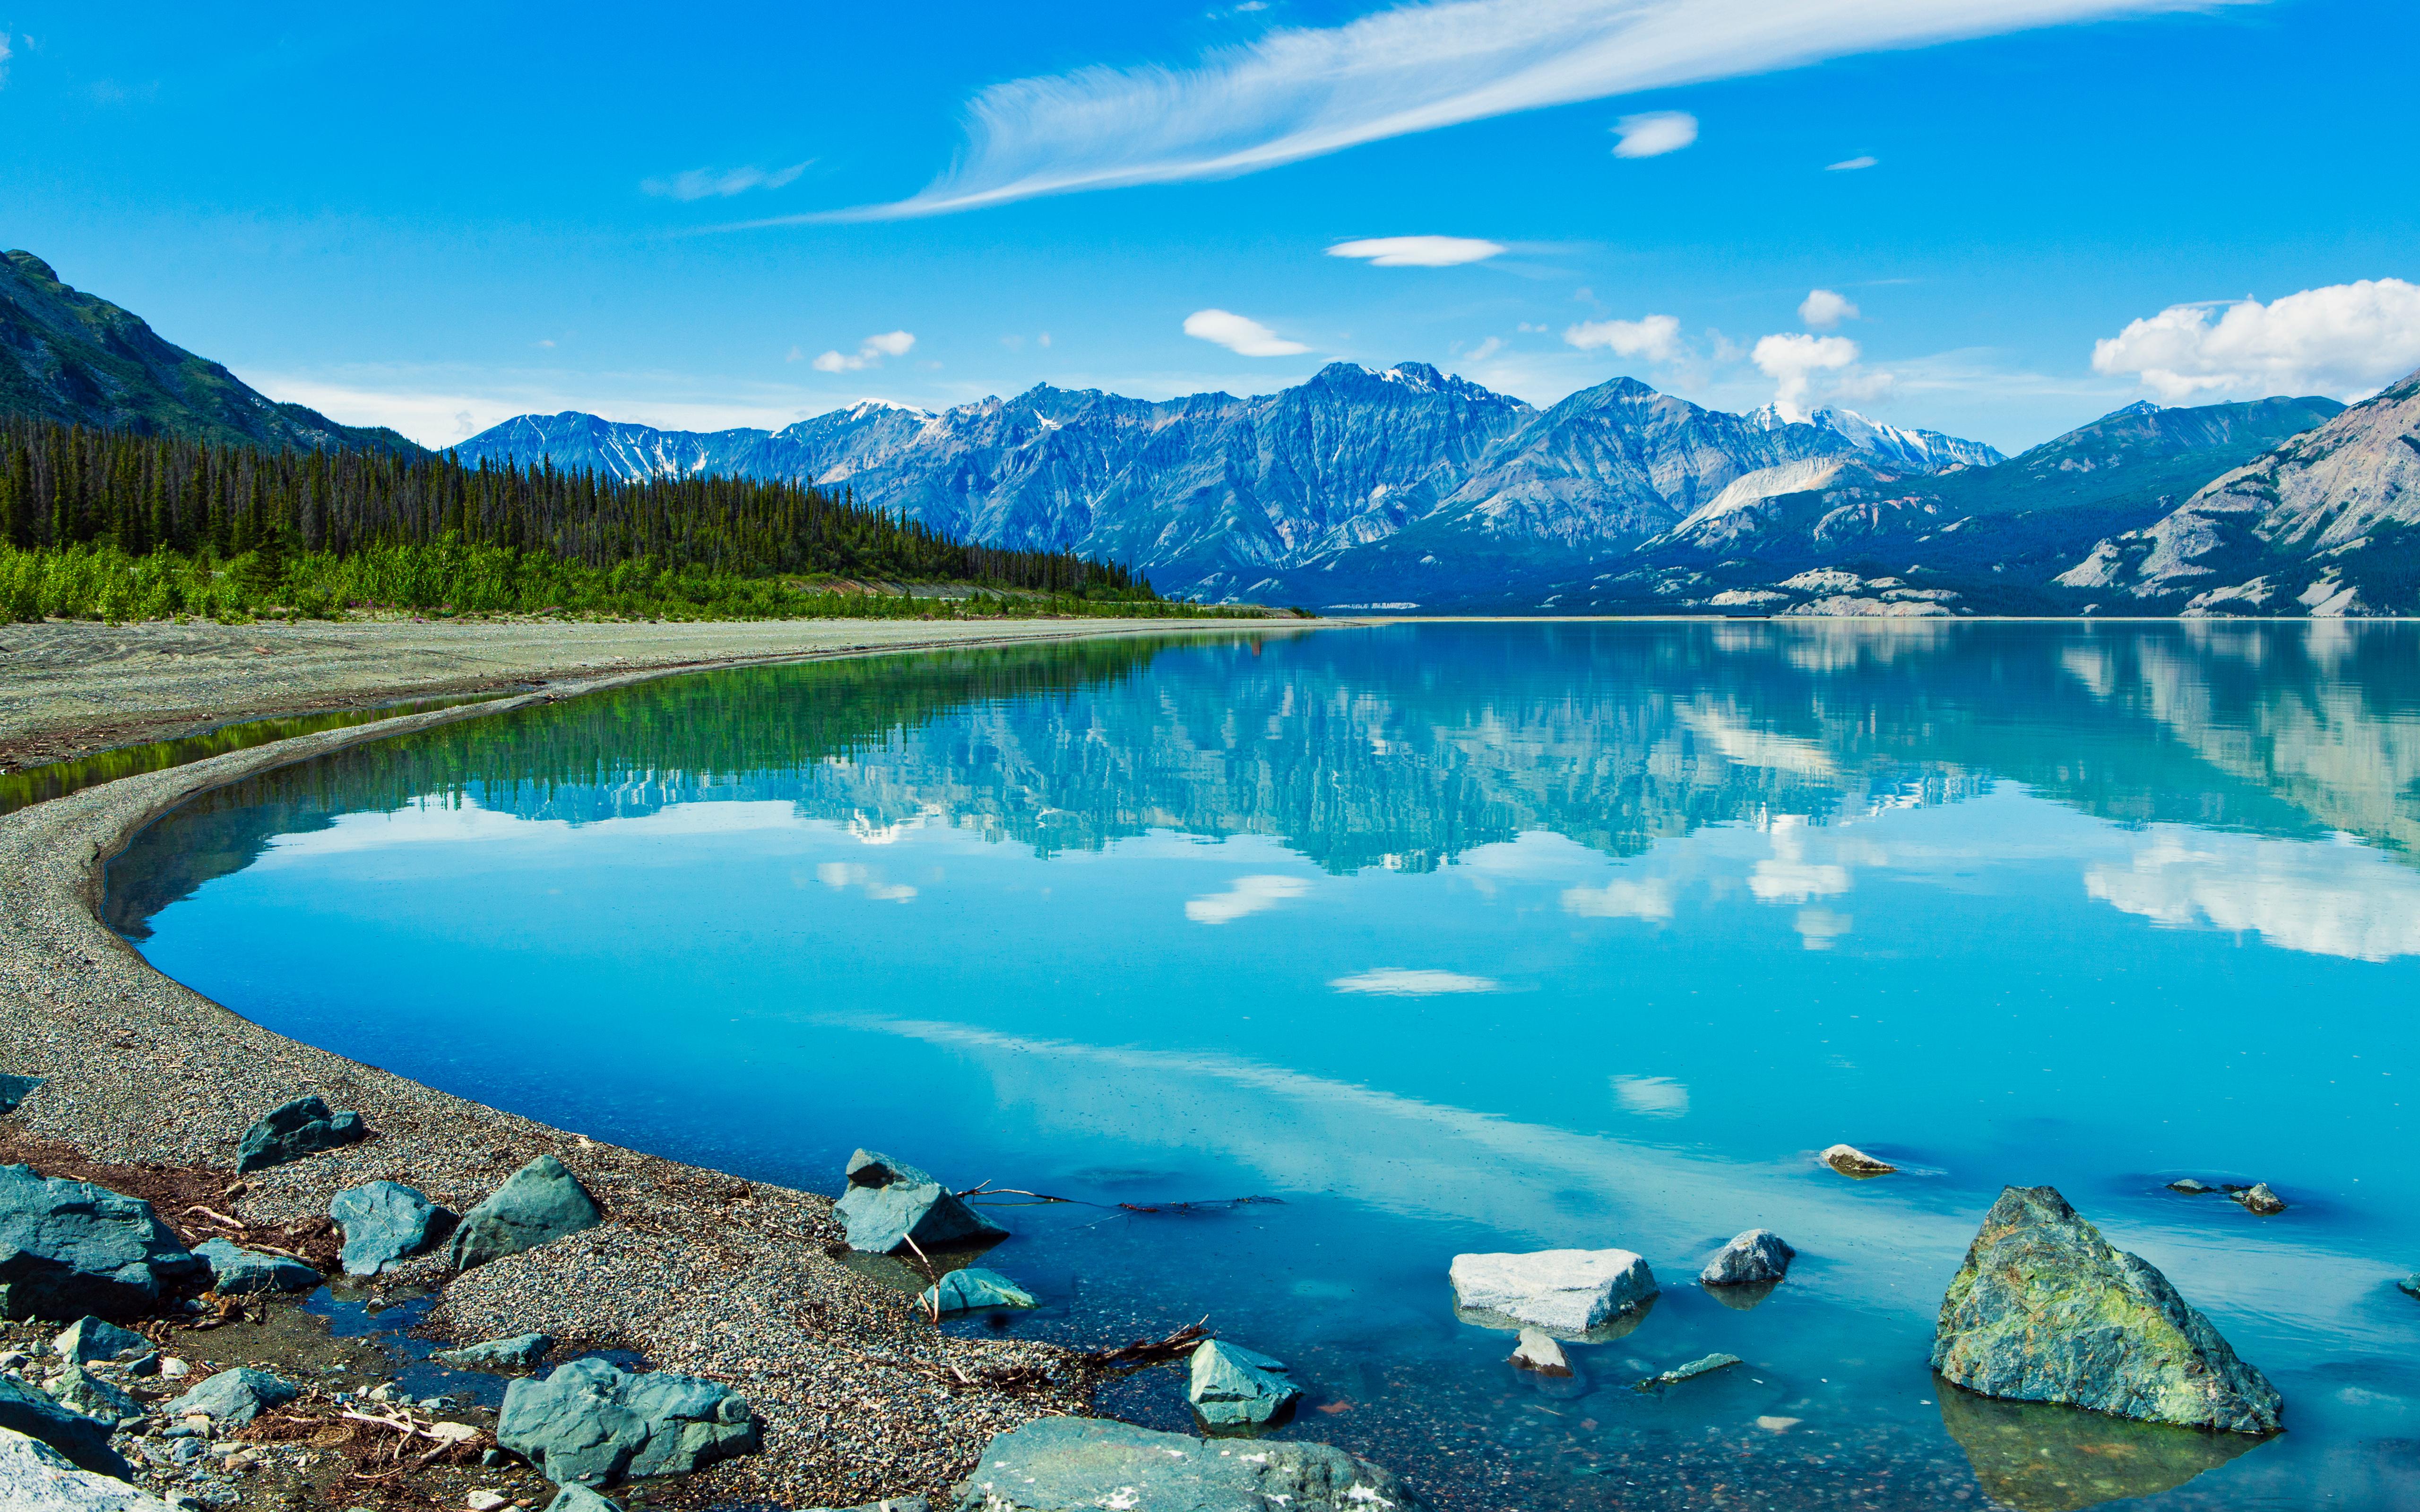 получили картинки фото озера внутри гор думают, что инди